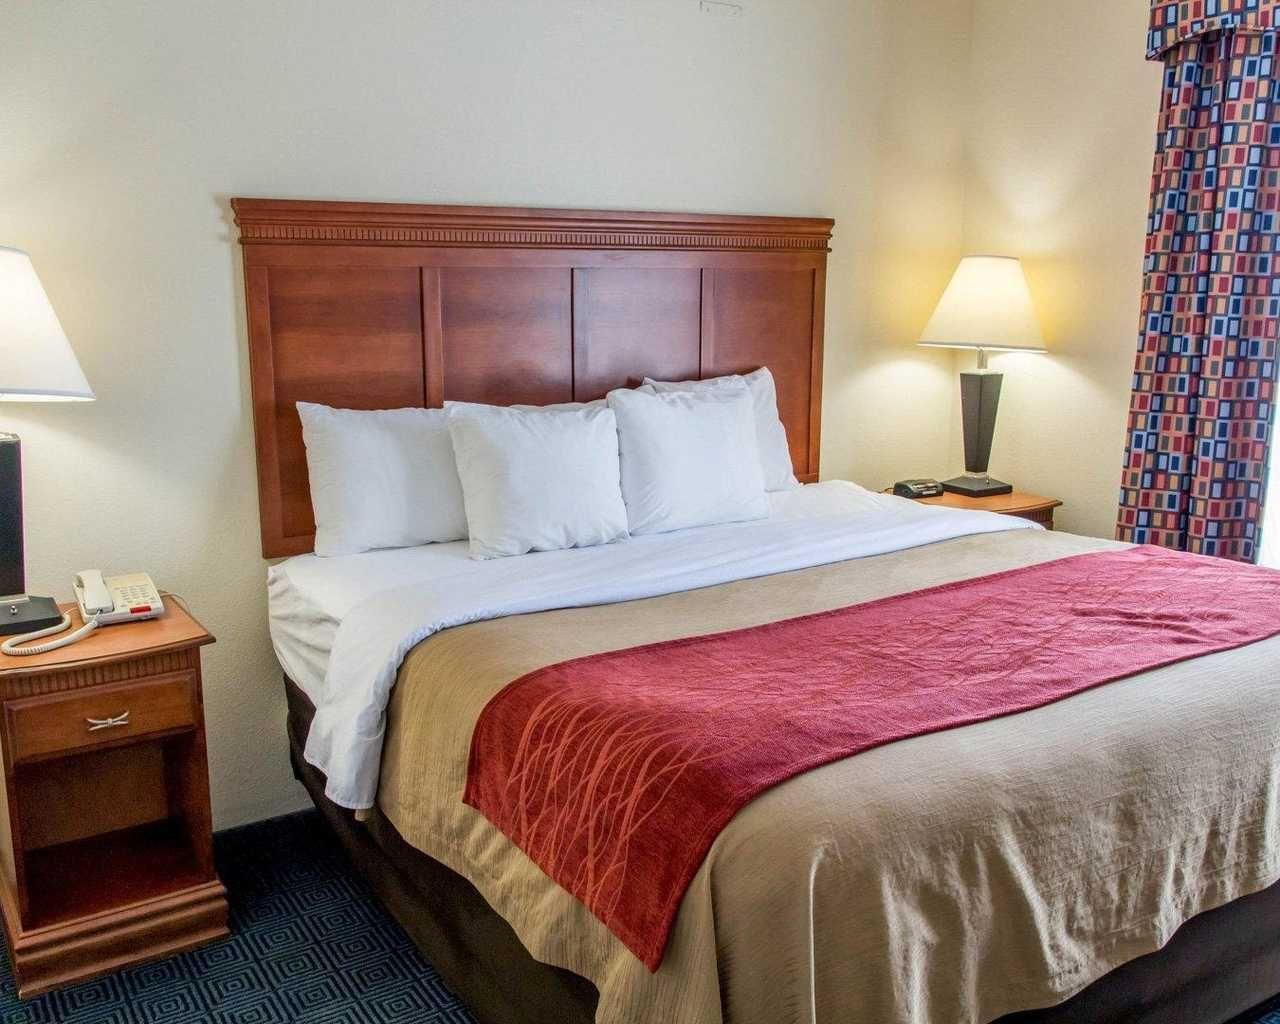 Plan your getaway in Statesboro GA and enjoy visiting